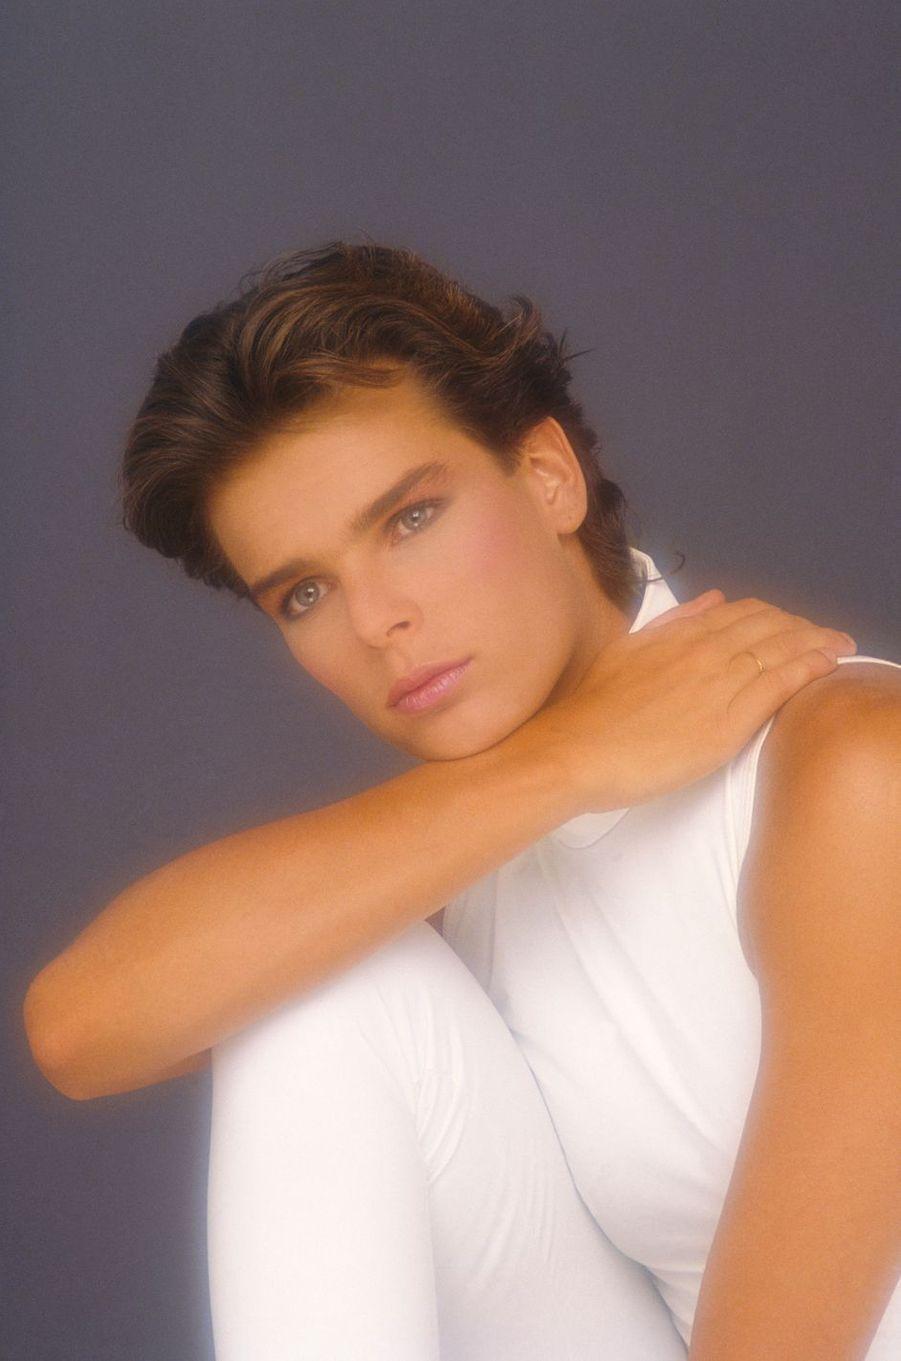 "La princesse Stéphanie de Monaco. Photo de couverture de son album ""Ouragan"" en 1986"